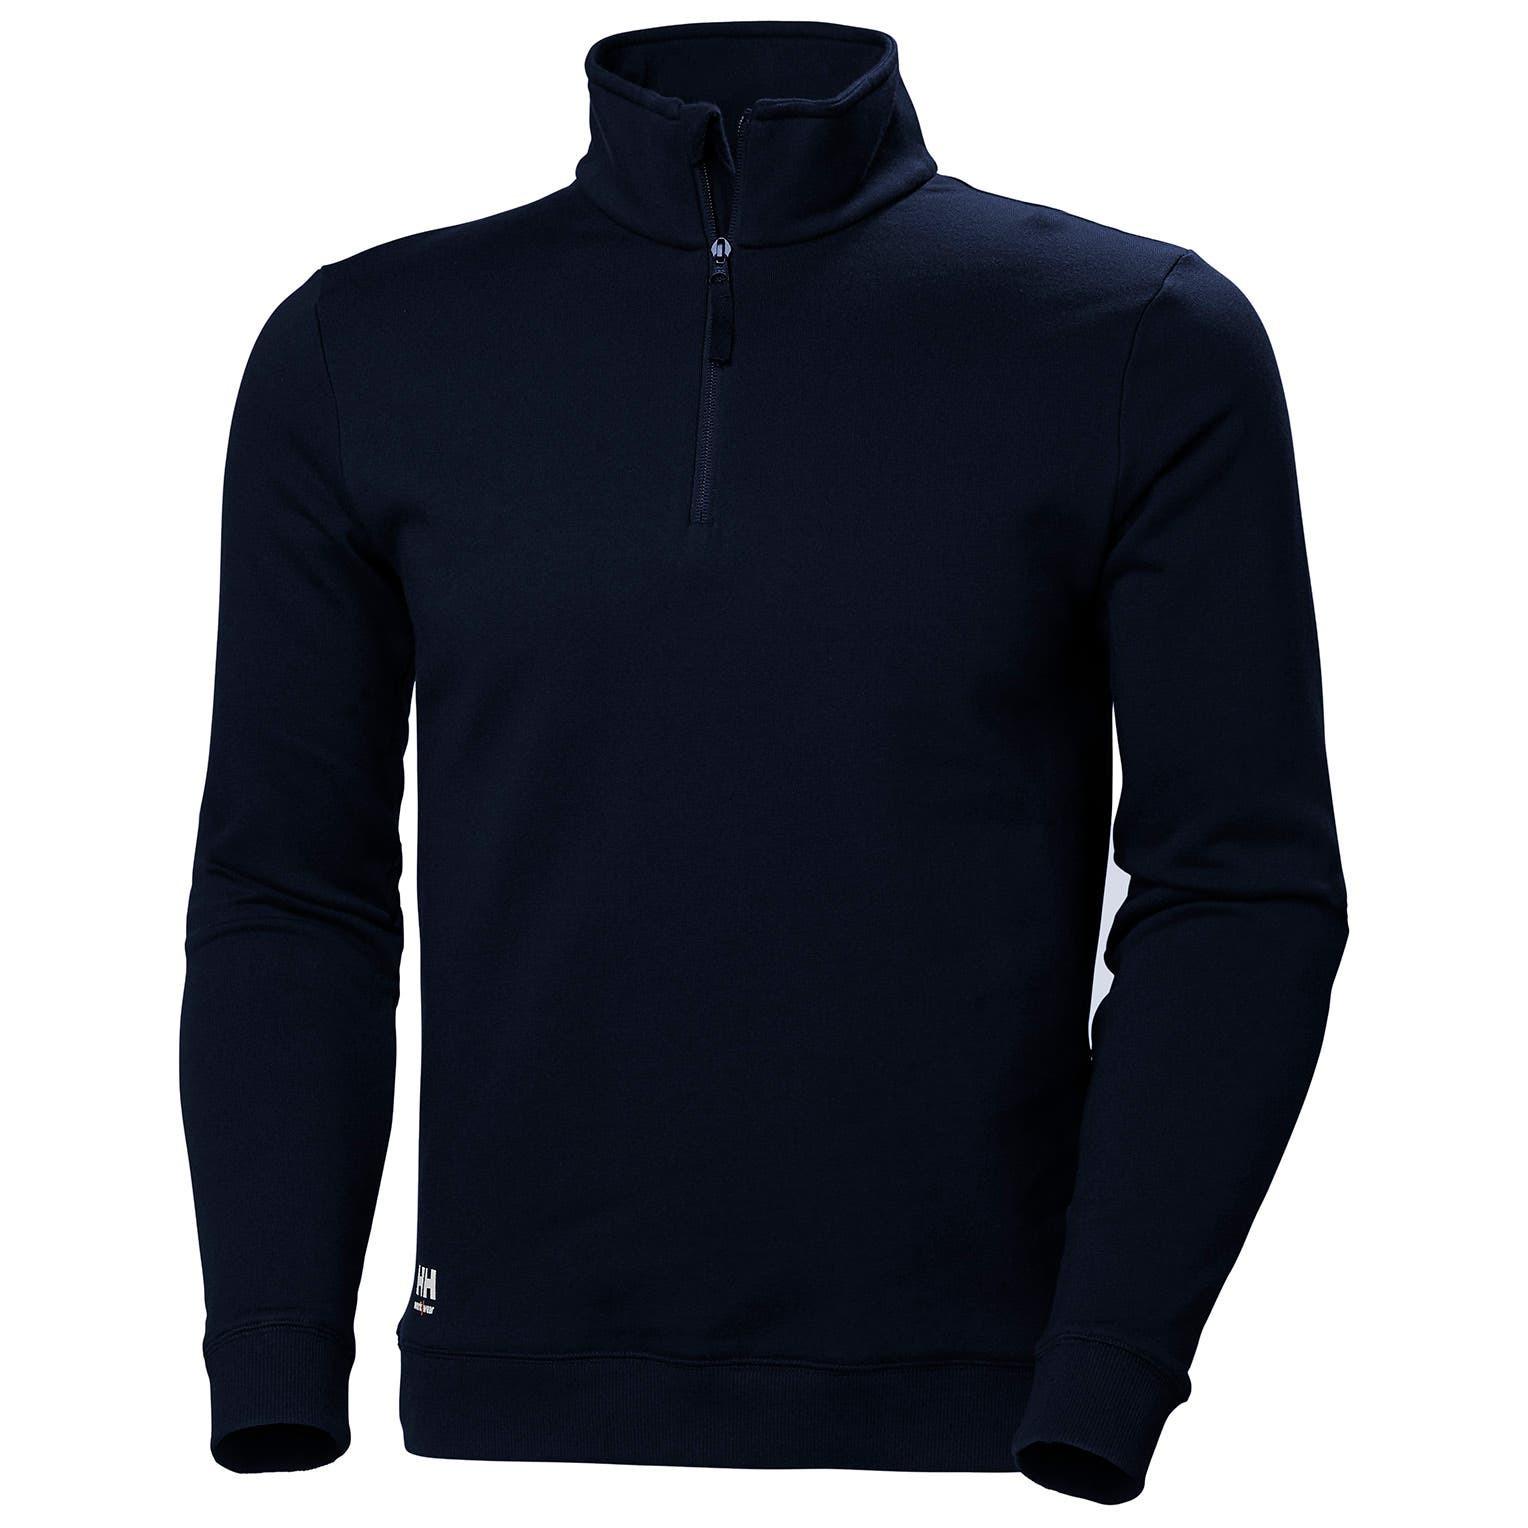 Свитшот на молнии Helly Hansen Manchester Hz Sweatshirt - 79210 (Navy)